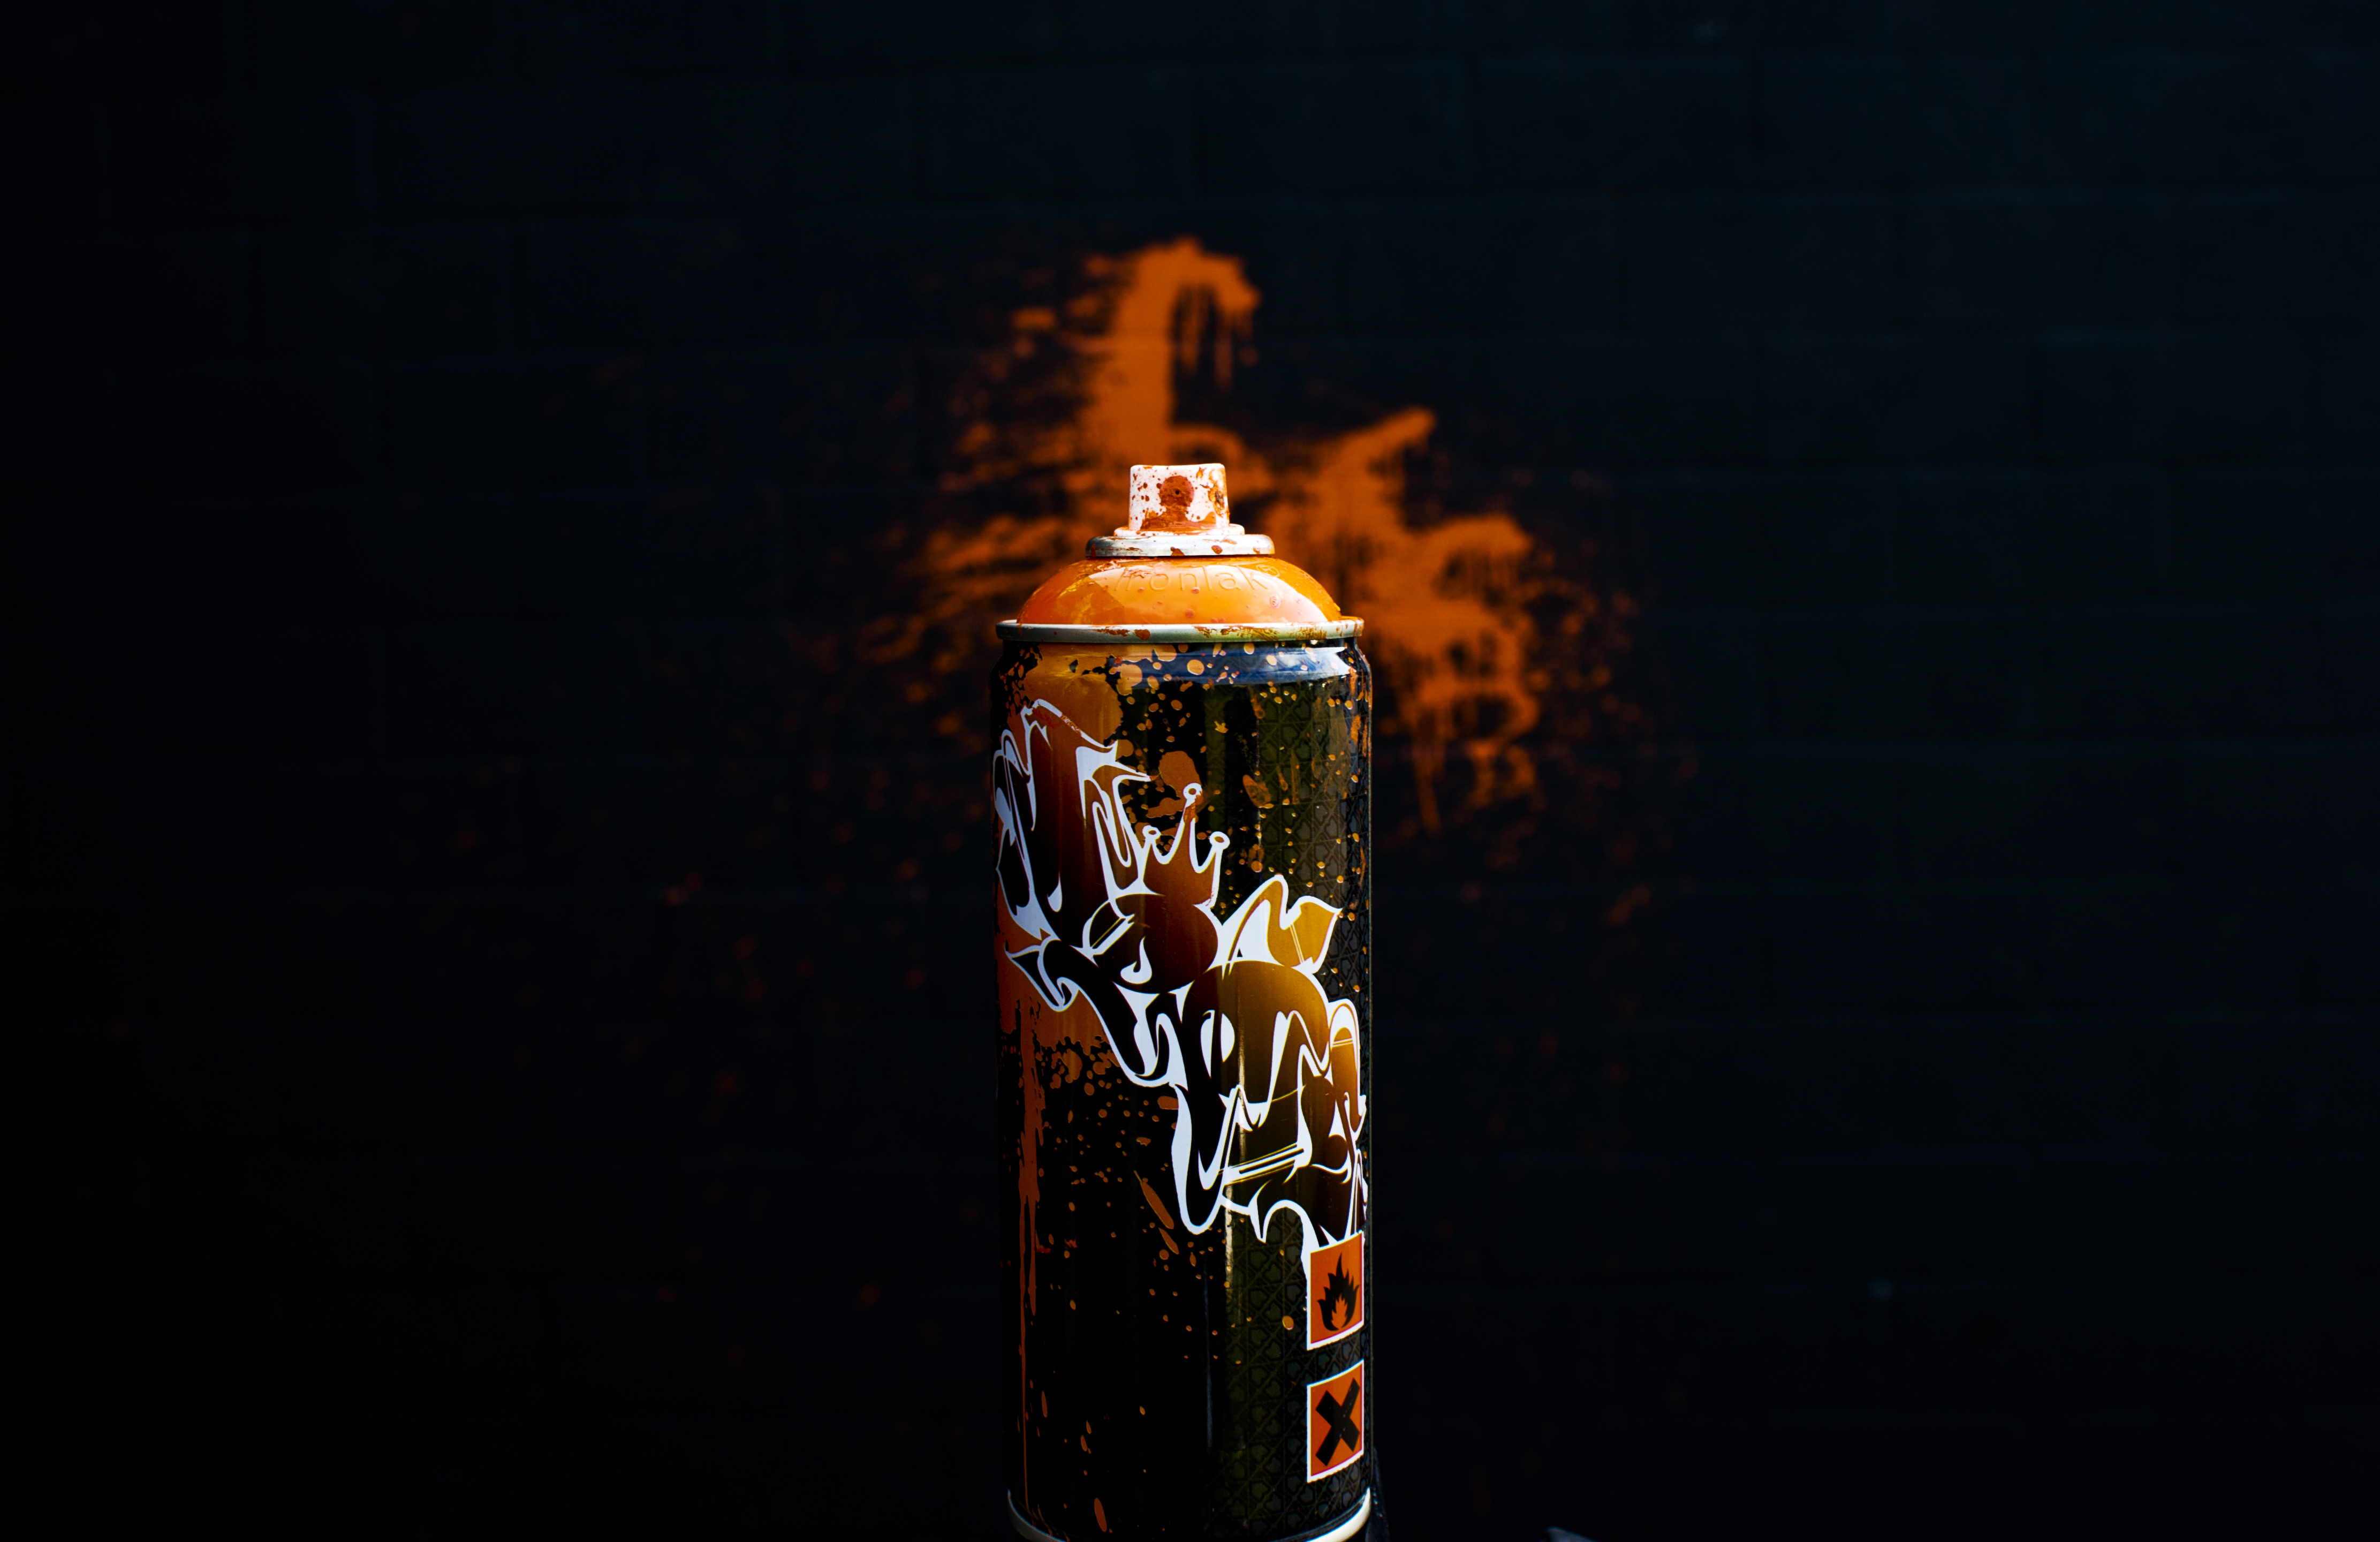 A work by Does - Spraycan dieci does 3